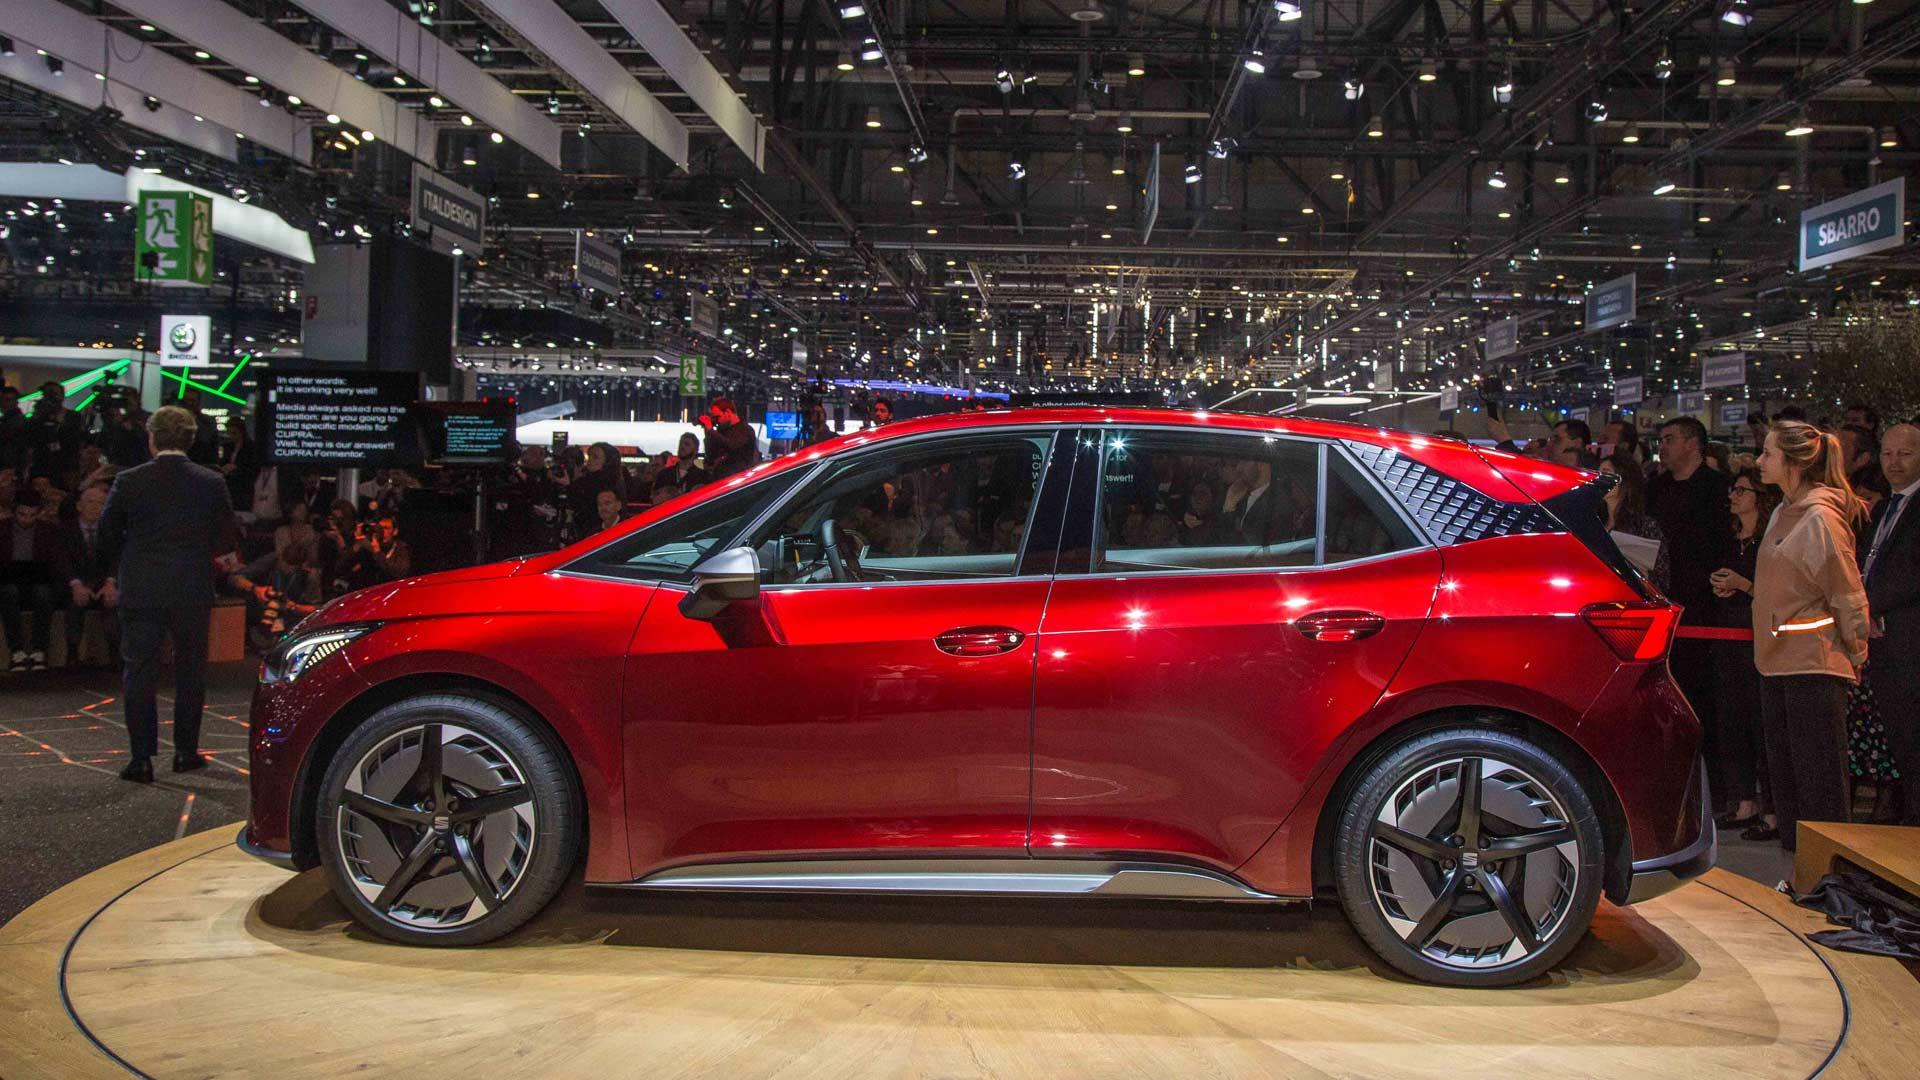 SEAT-el-Born-concept Geneva-2019_3